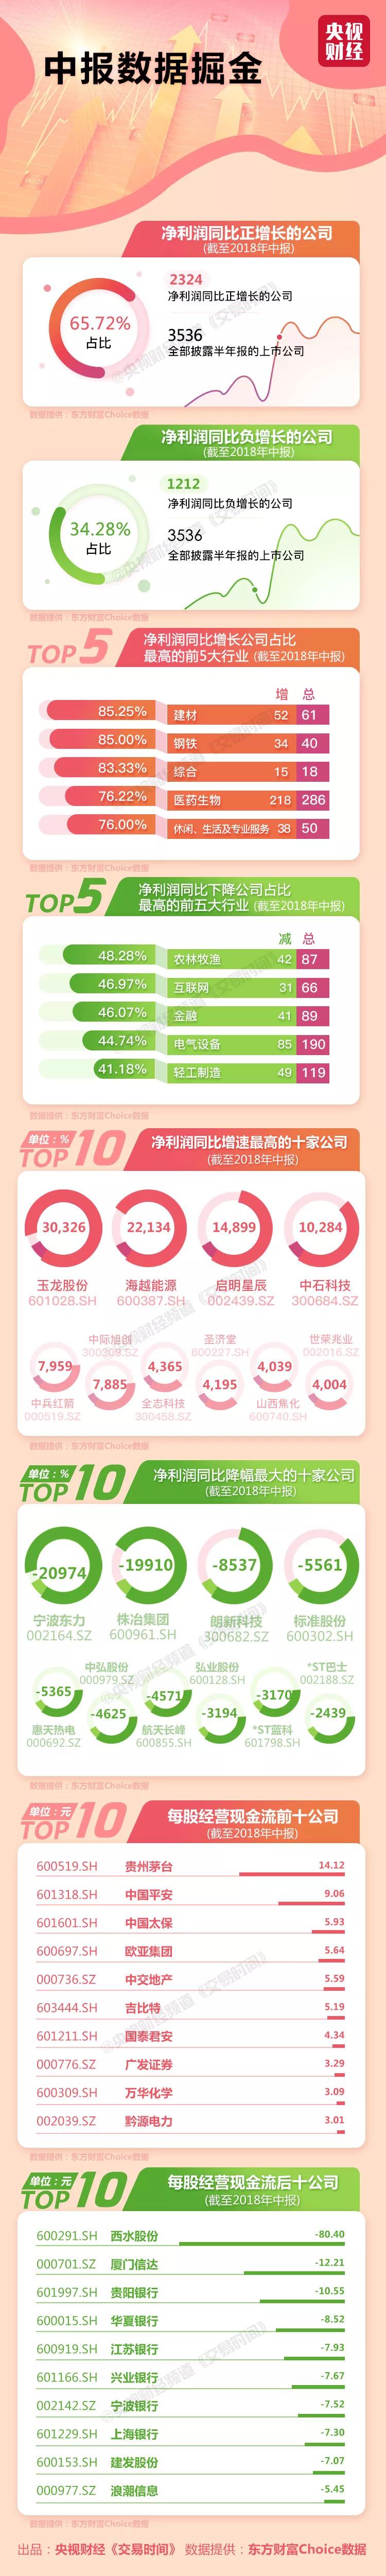 A股中报上市公司TOP10出炉:最赚钱公司日赚近9亿